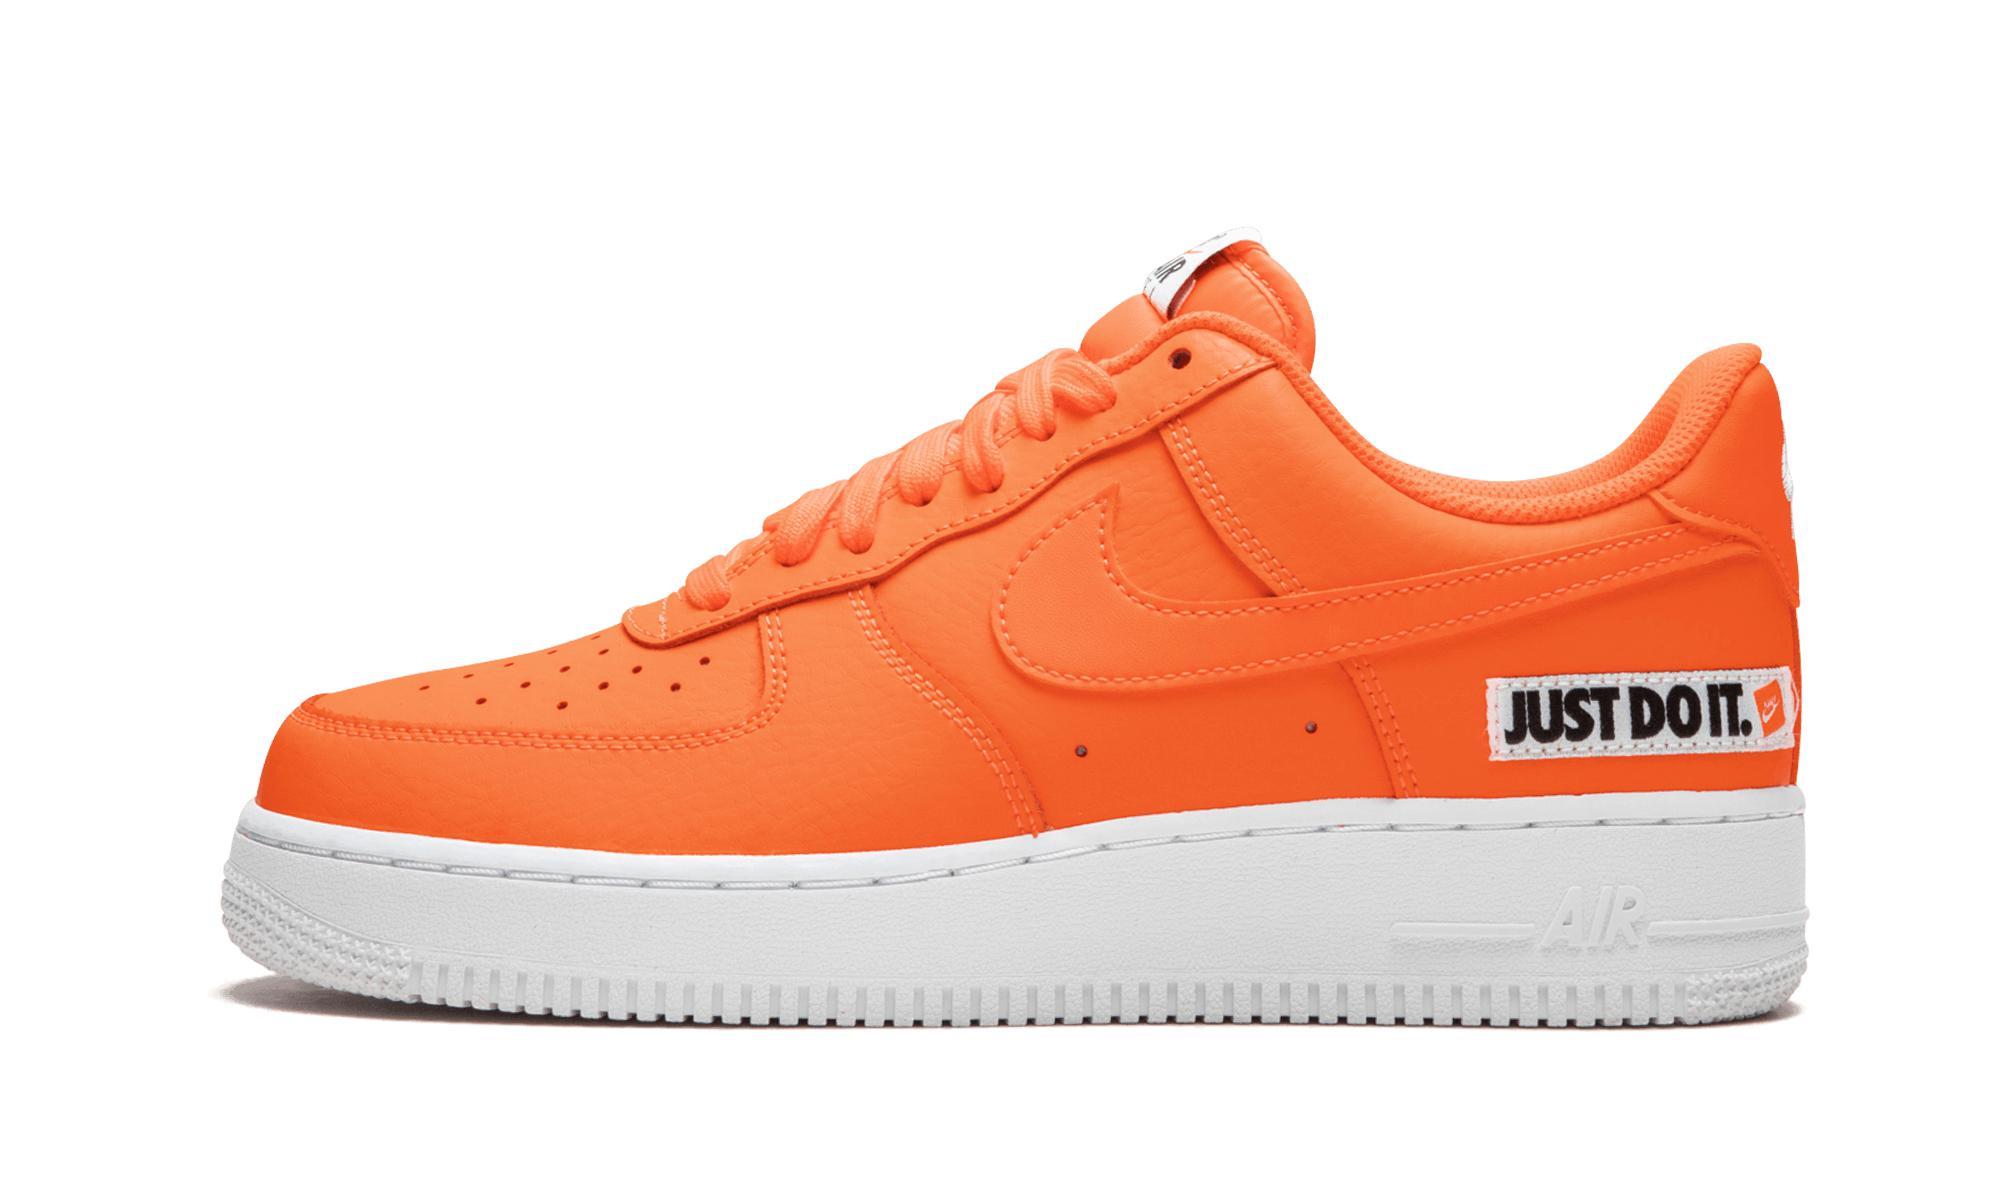 e80f11a8fe0a Nike Air Force 1  07 Lv8 Jdi Lthr in Orange - Lyst